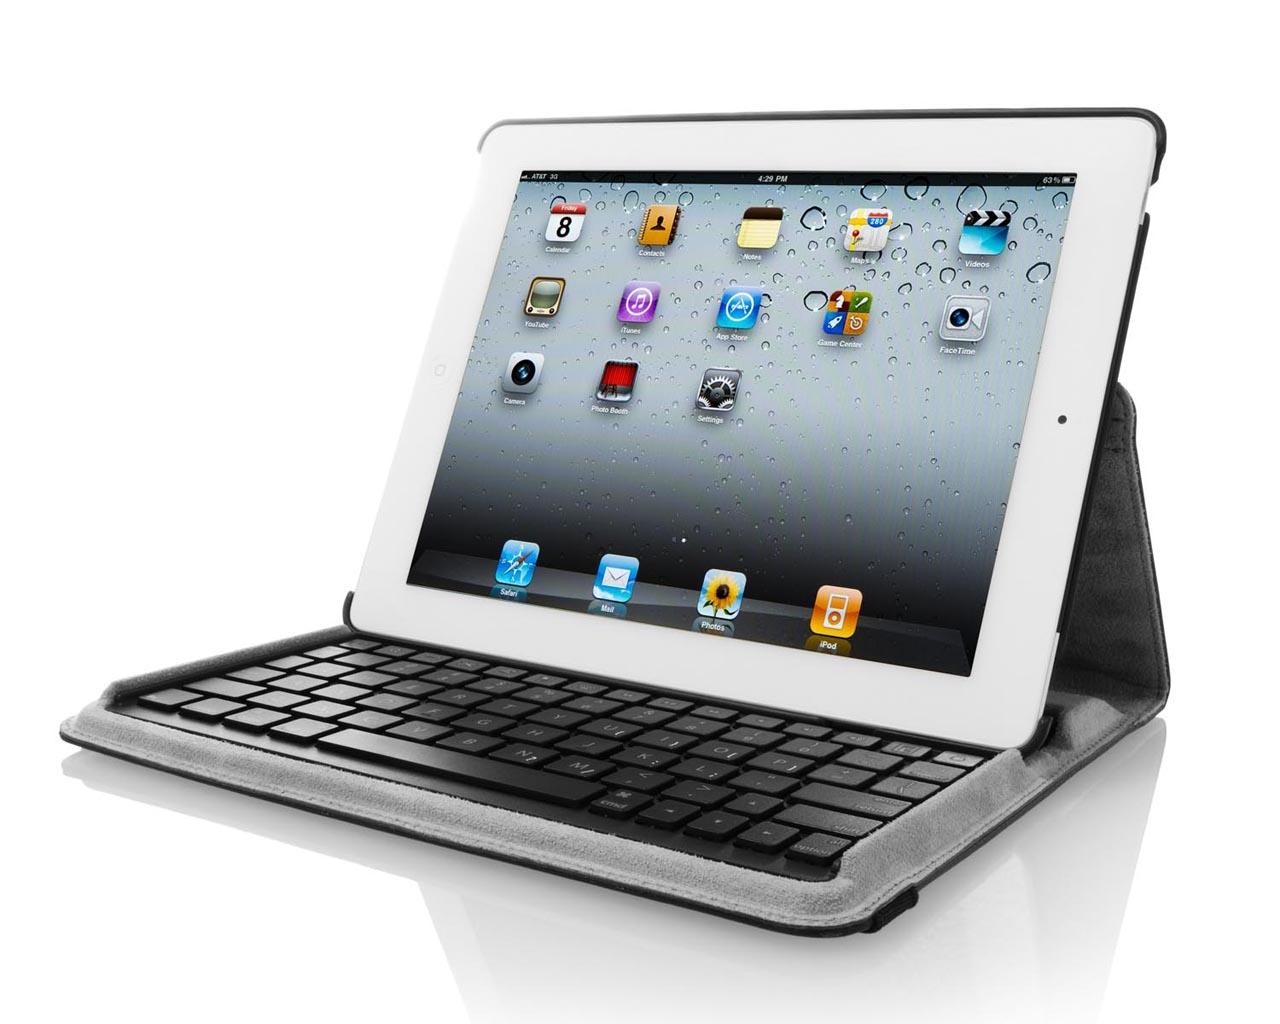 Targus Versavu Ipad 2 Keyboard Case Gadgetsin